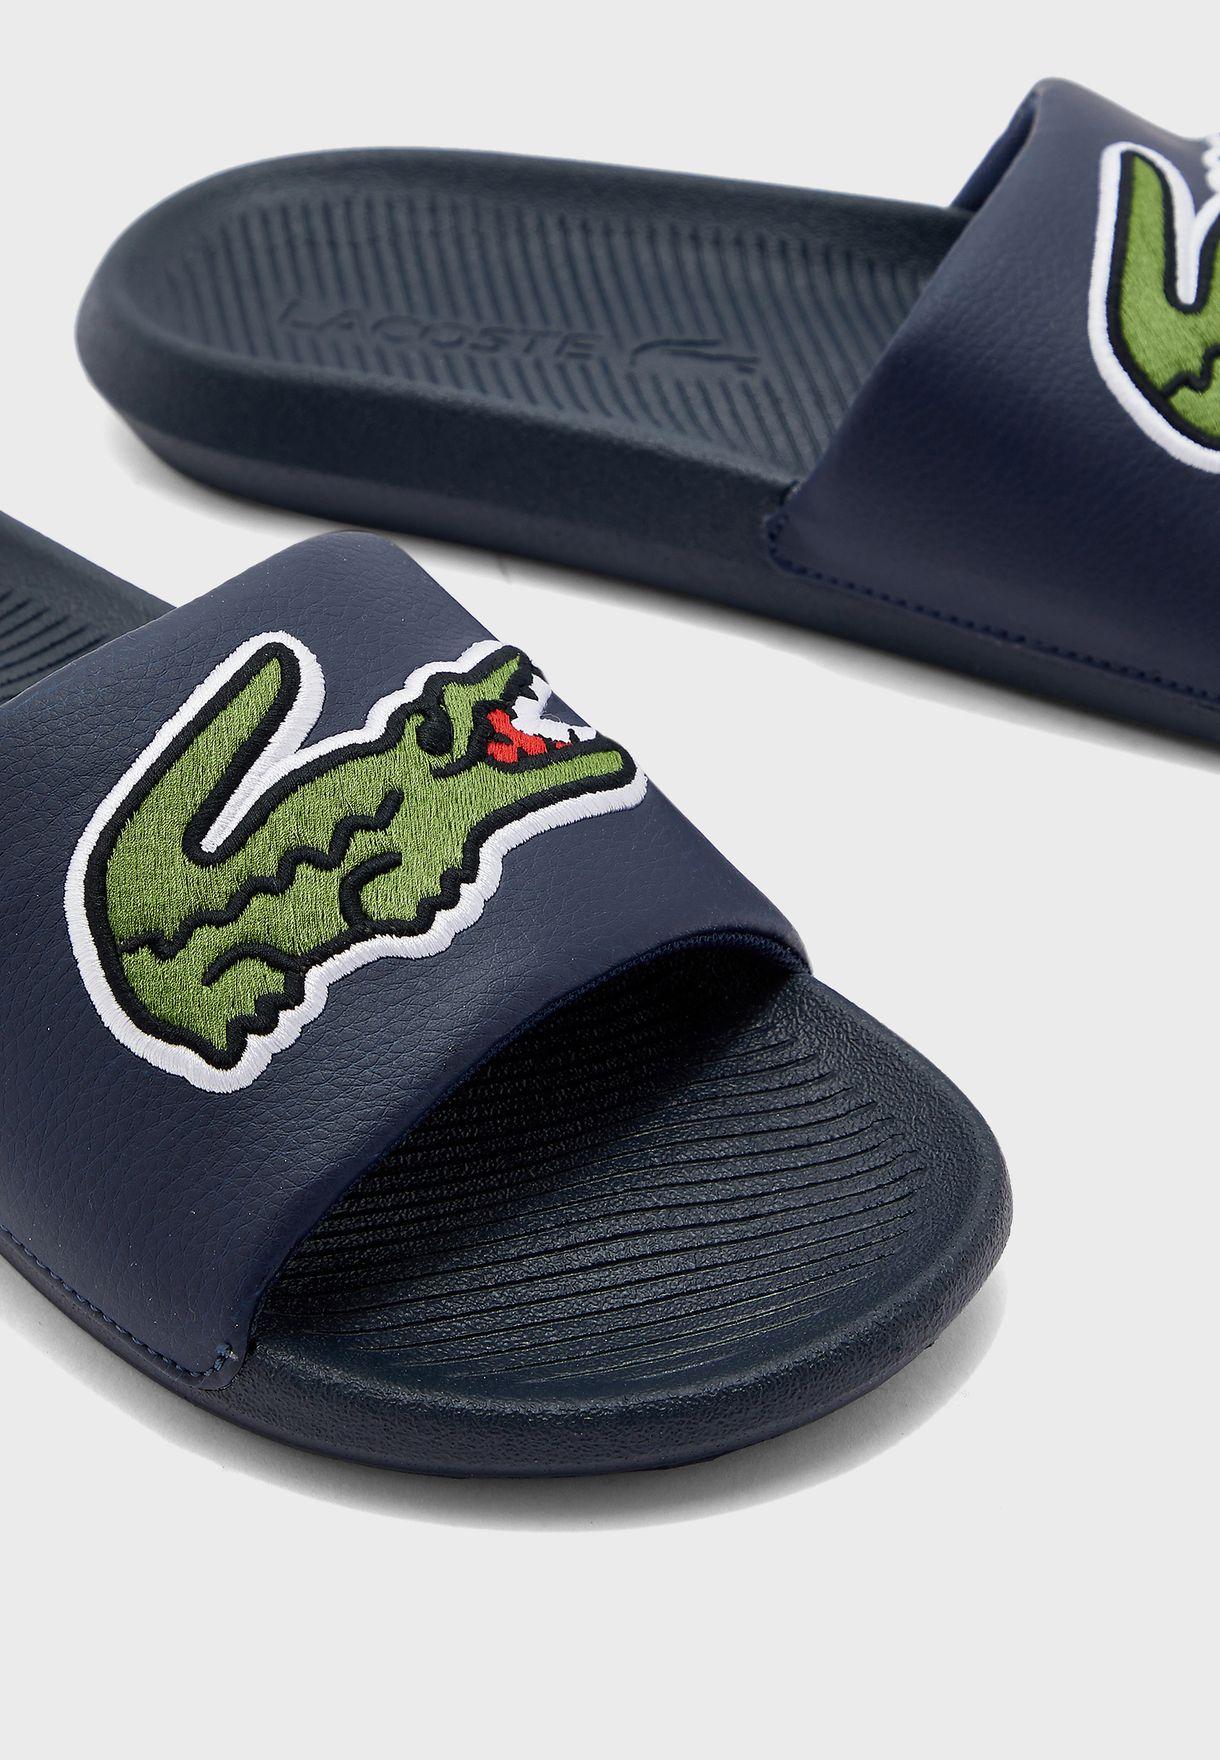 Croco Slide Flip Flop